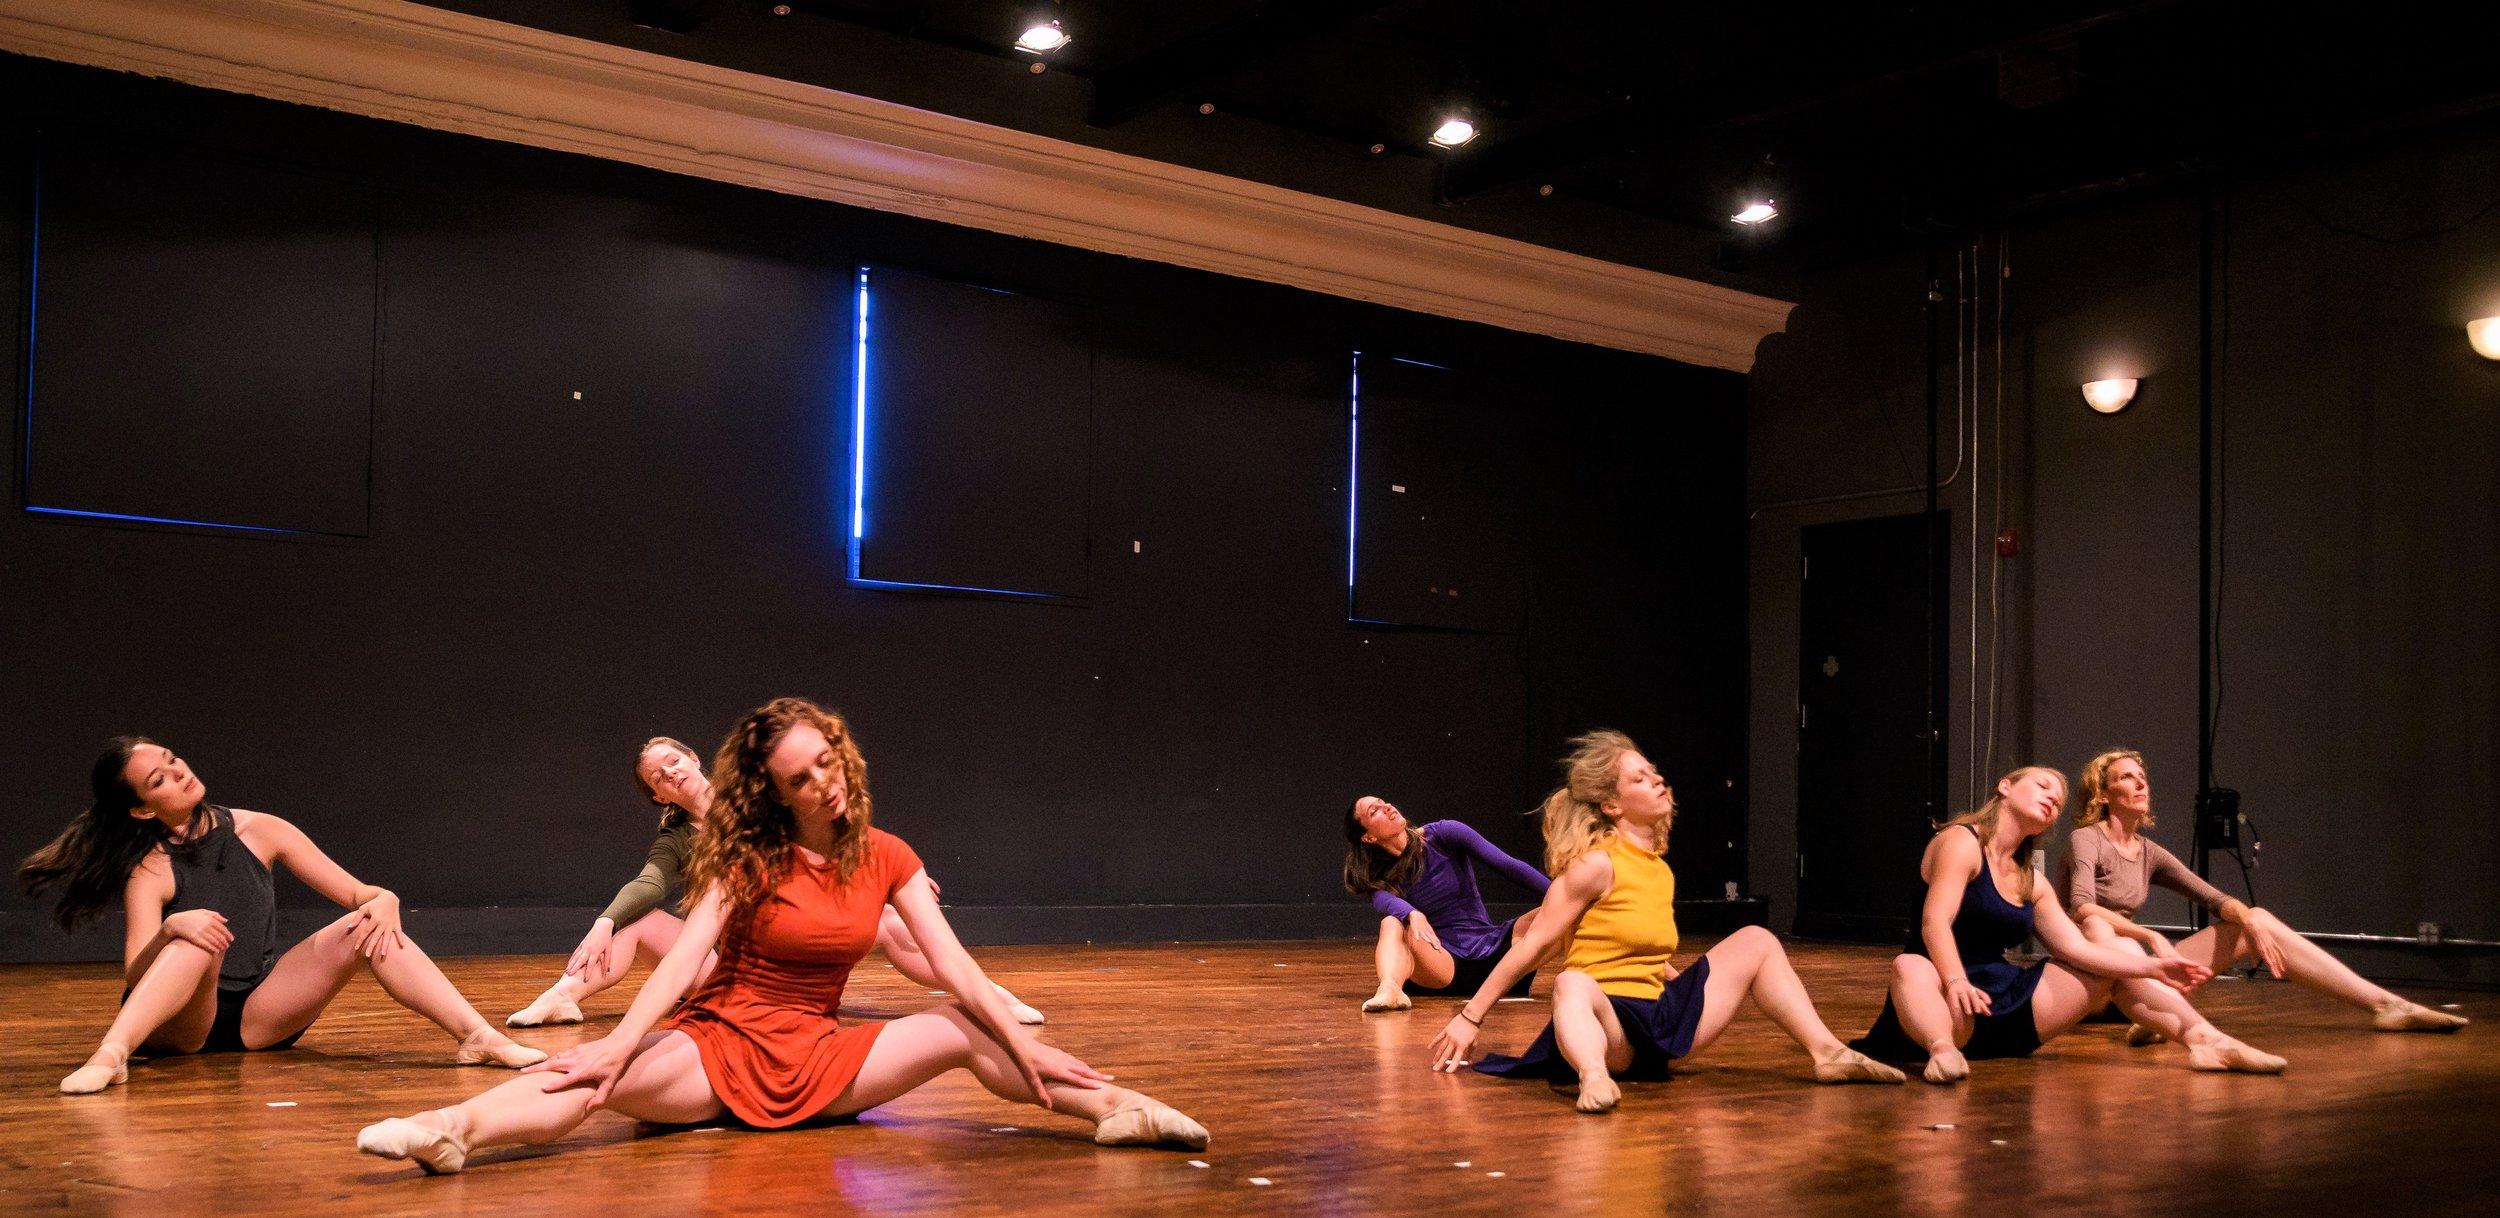 20160917 Dance Loft Open House-20160917 Dance Loft Open House-0088.jpg